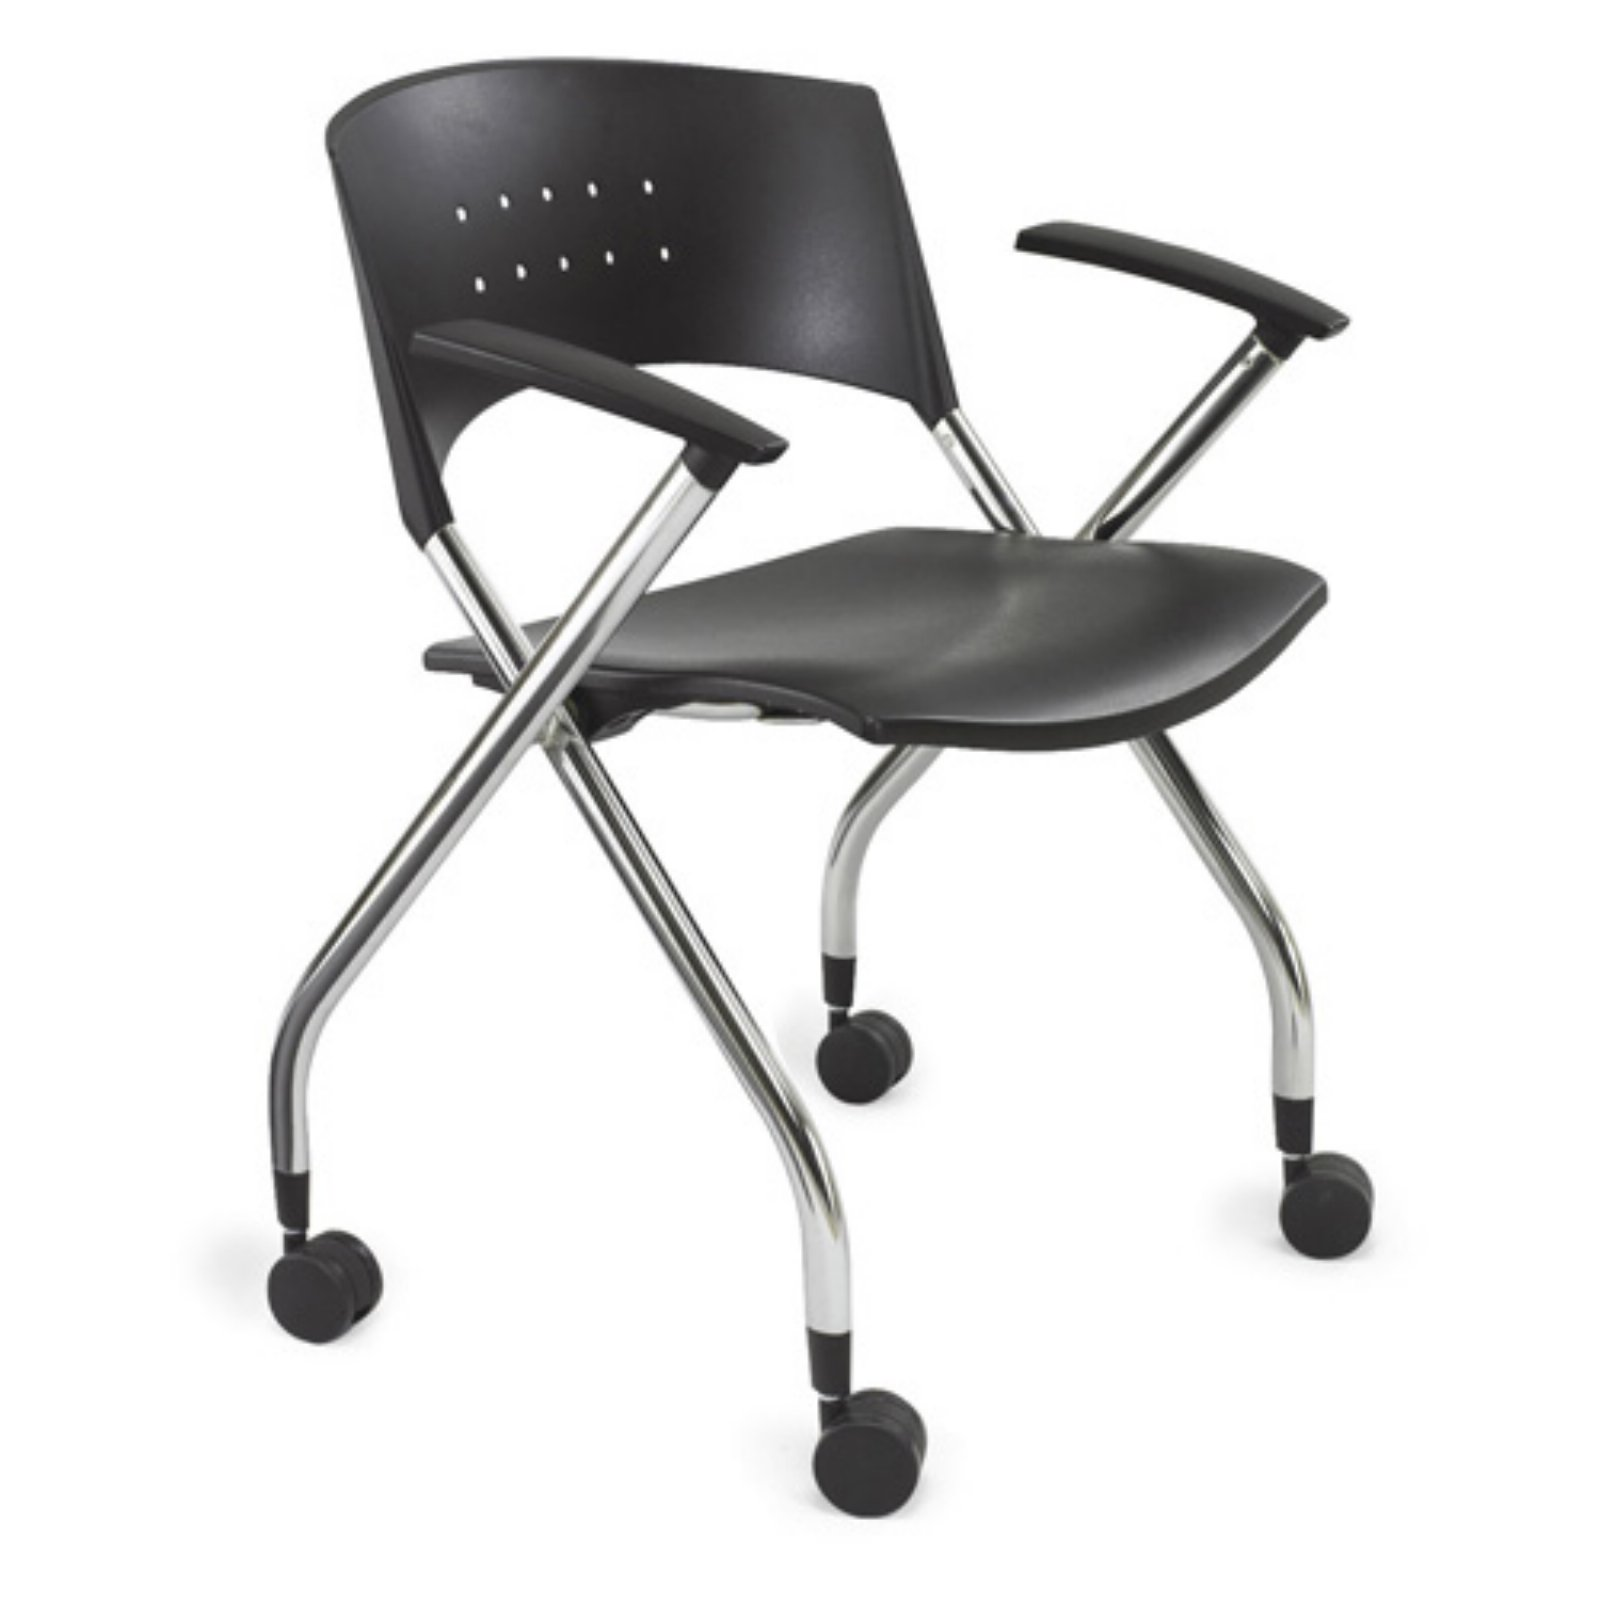 Safco 3480BL Xtc. Nesting Chair - Black - Set of 2